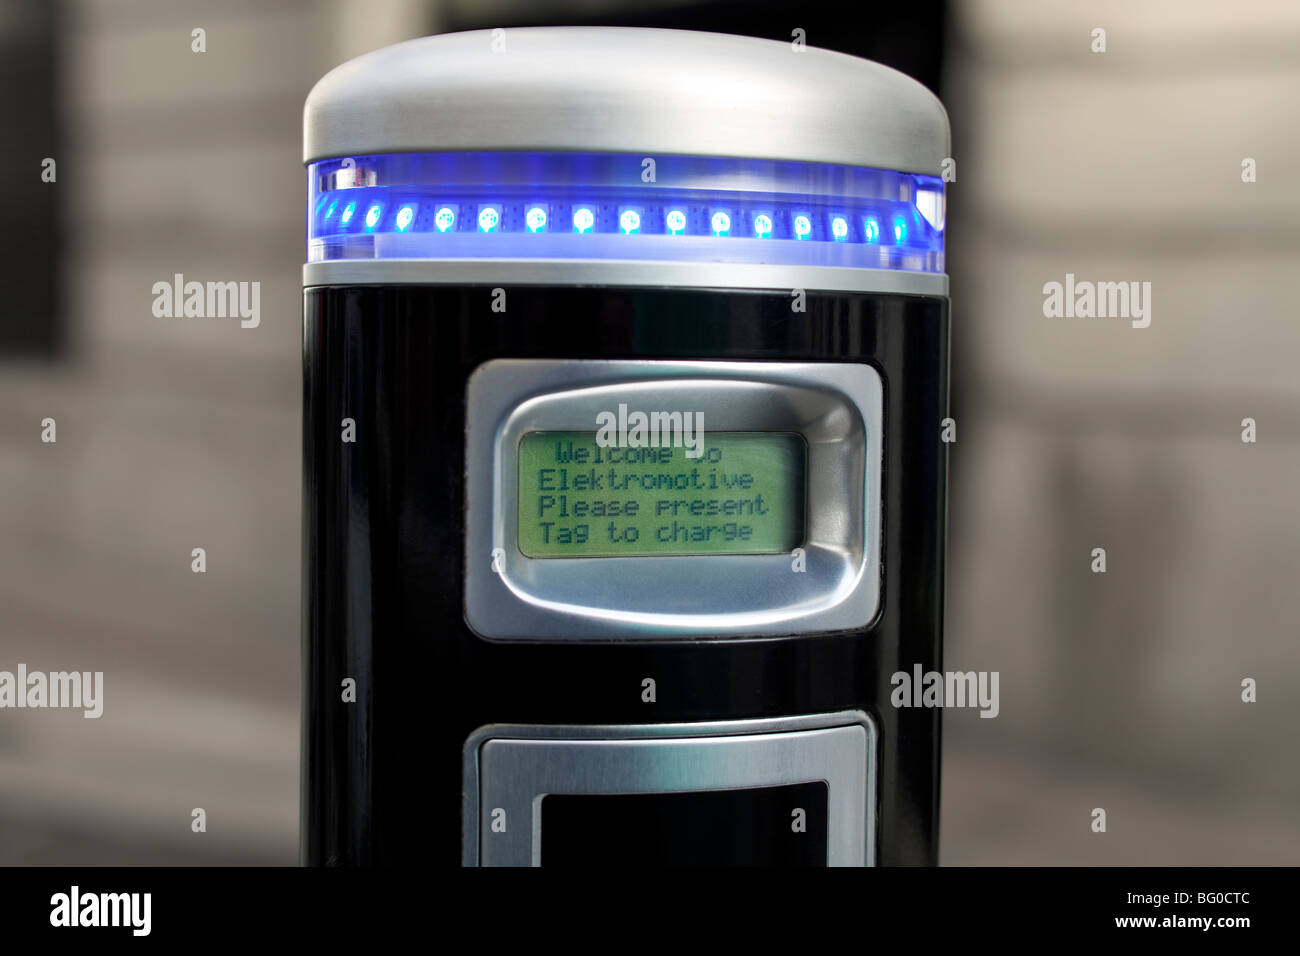 Electric vehicle charging bay, London, UK - Stock Image